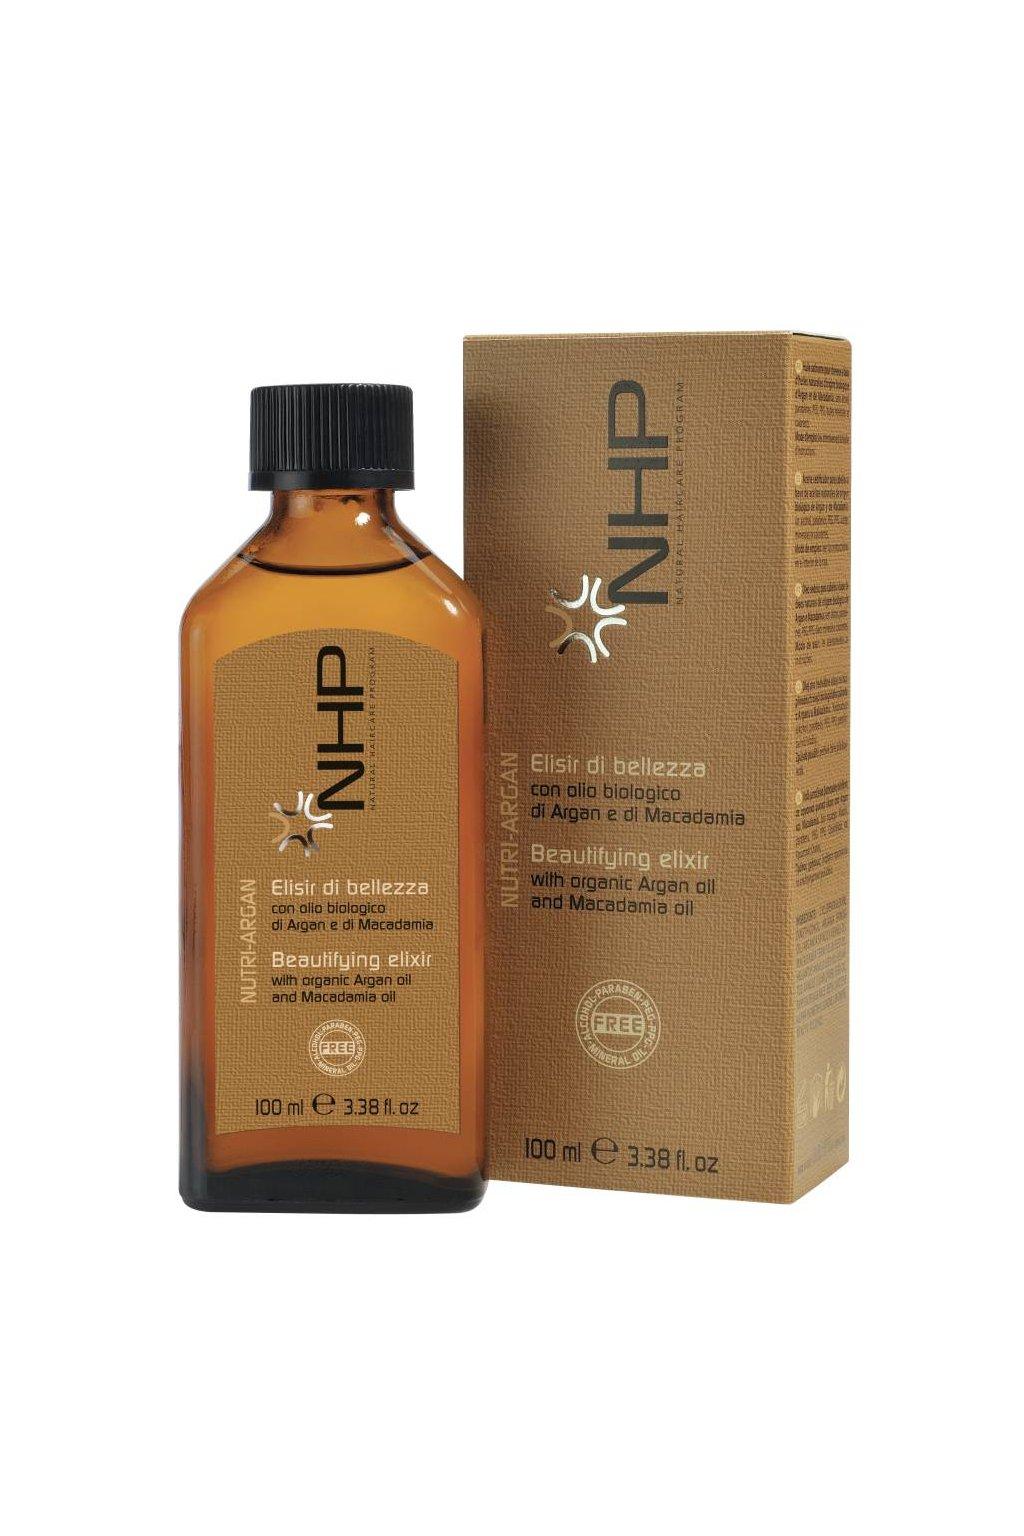 6416 nhp elixir krasy s arganovy a makadamiovy olej 100ml